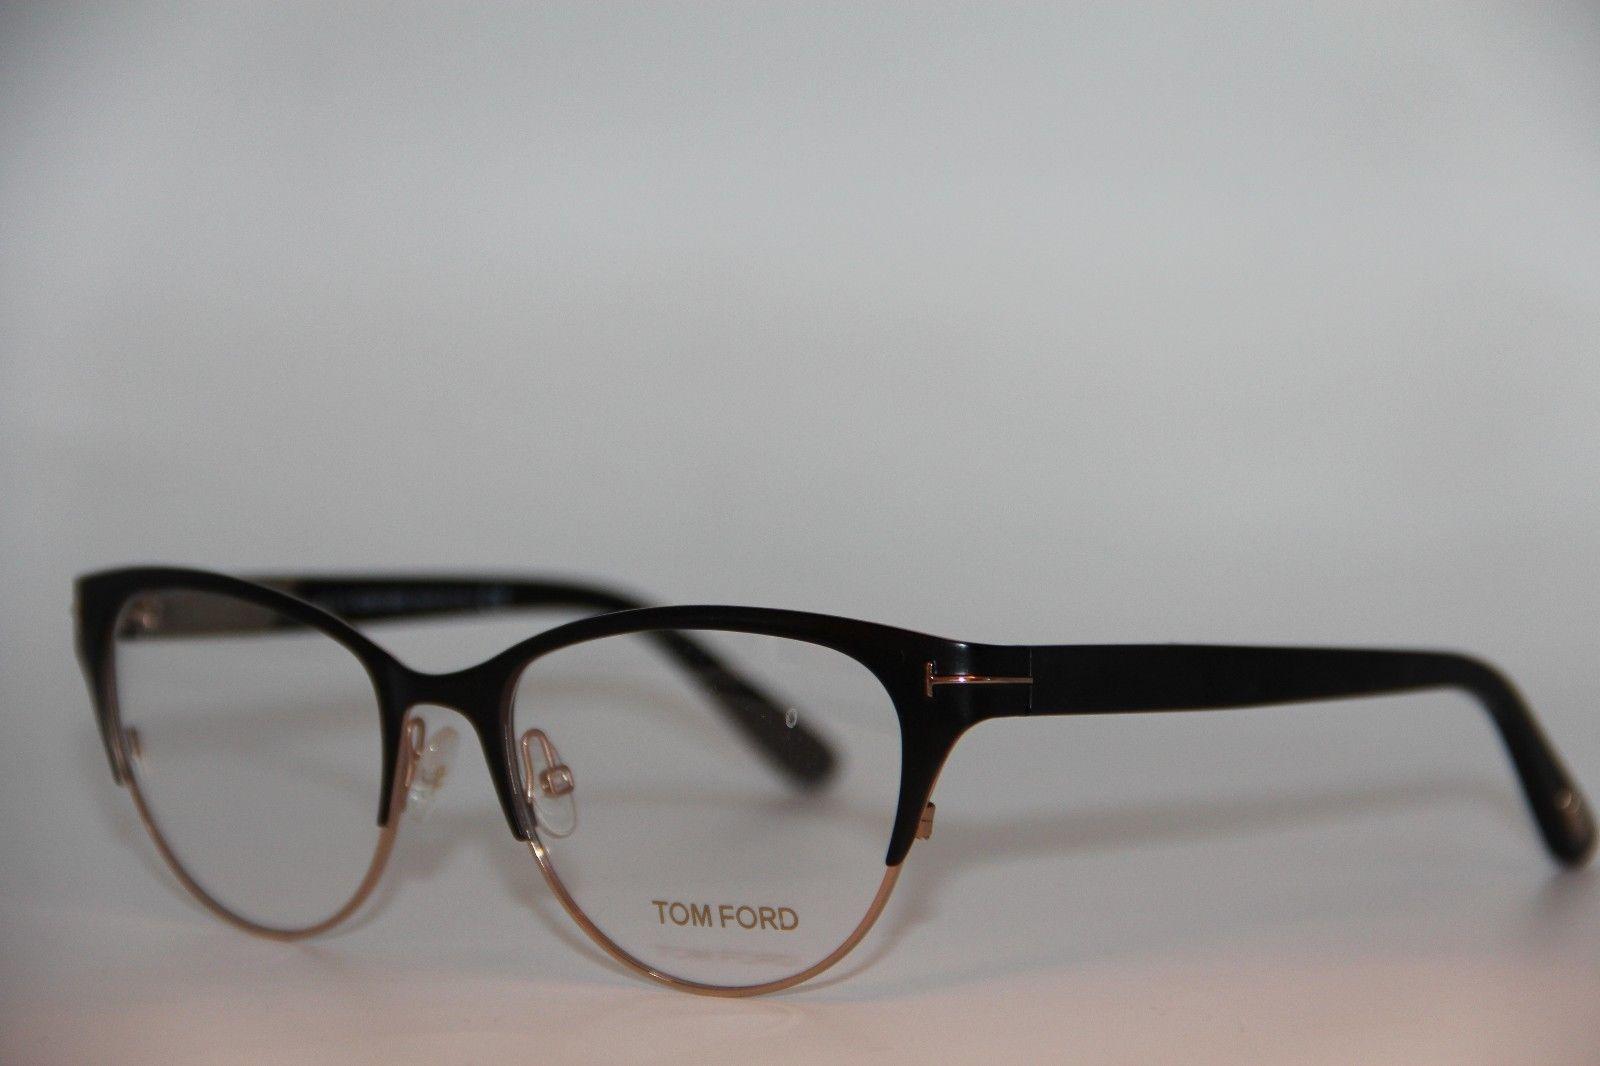 9dd5ef2a3c09 New Tom Ford Tf 5318 002 Black Eyeglasses and 50 similar items. 57